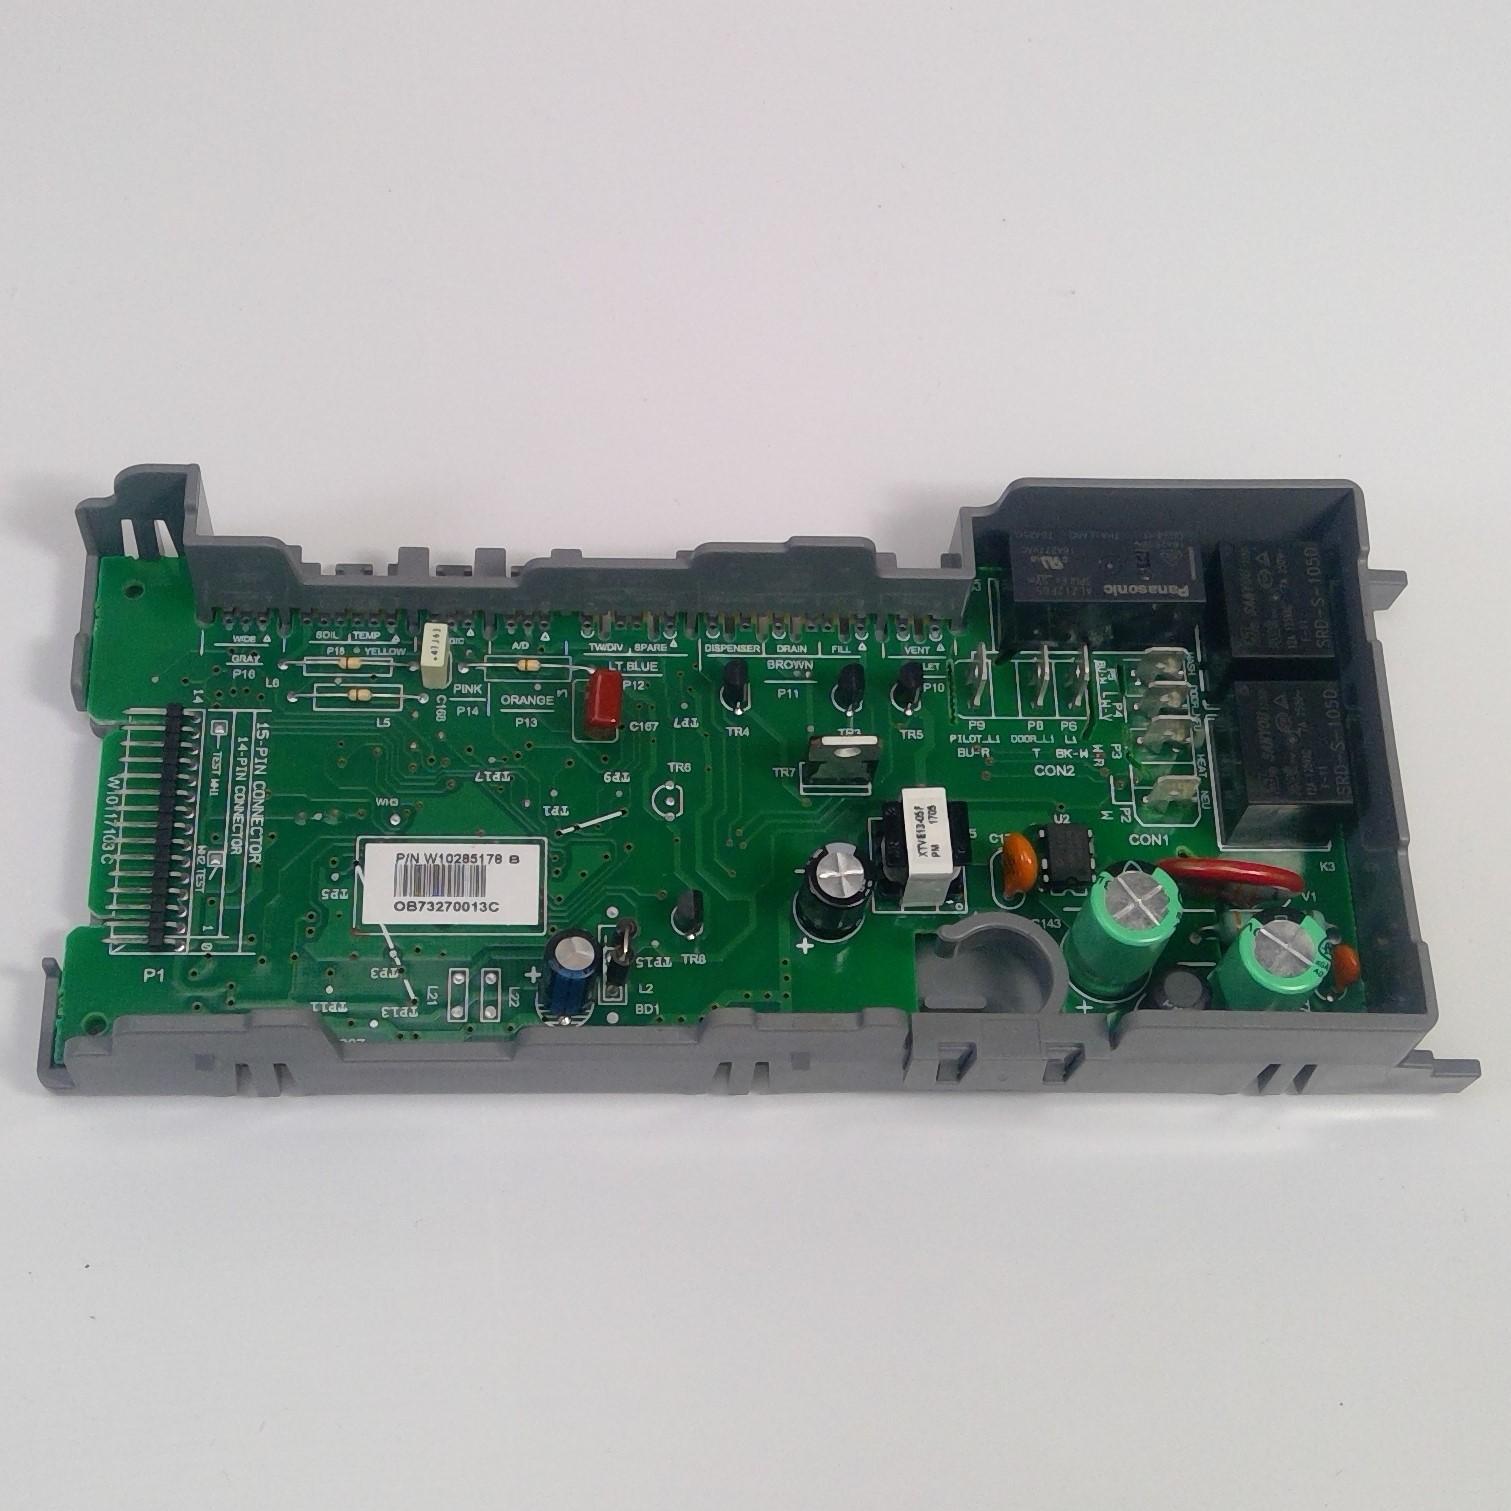 WHIRLPOOL Dishwasher MAIN CONTROL BOARD WPW10285178